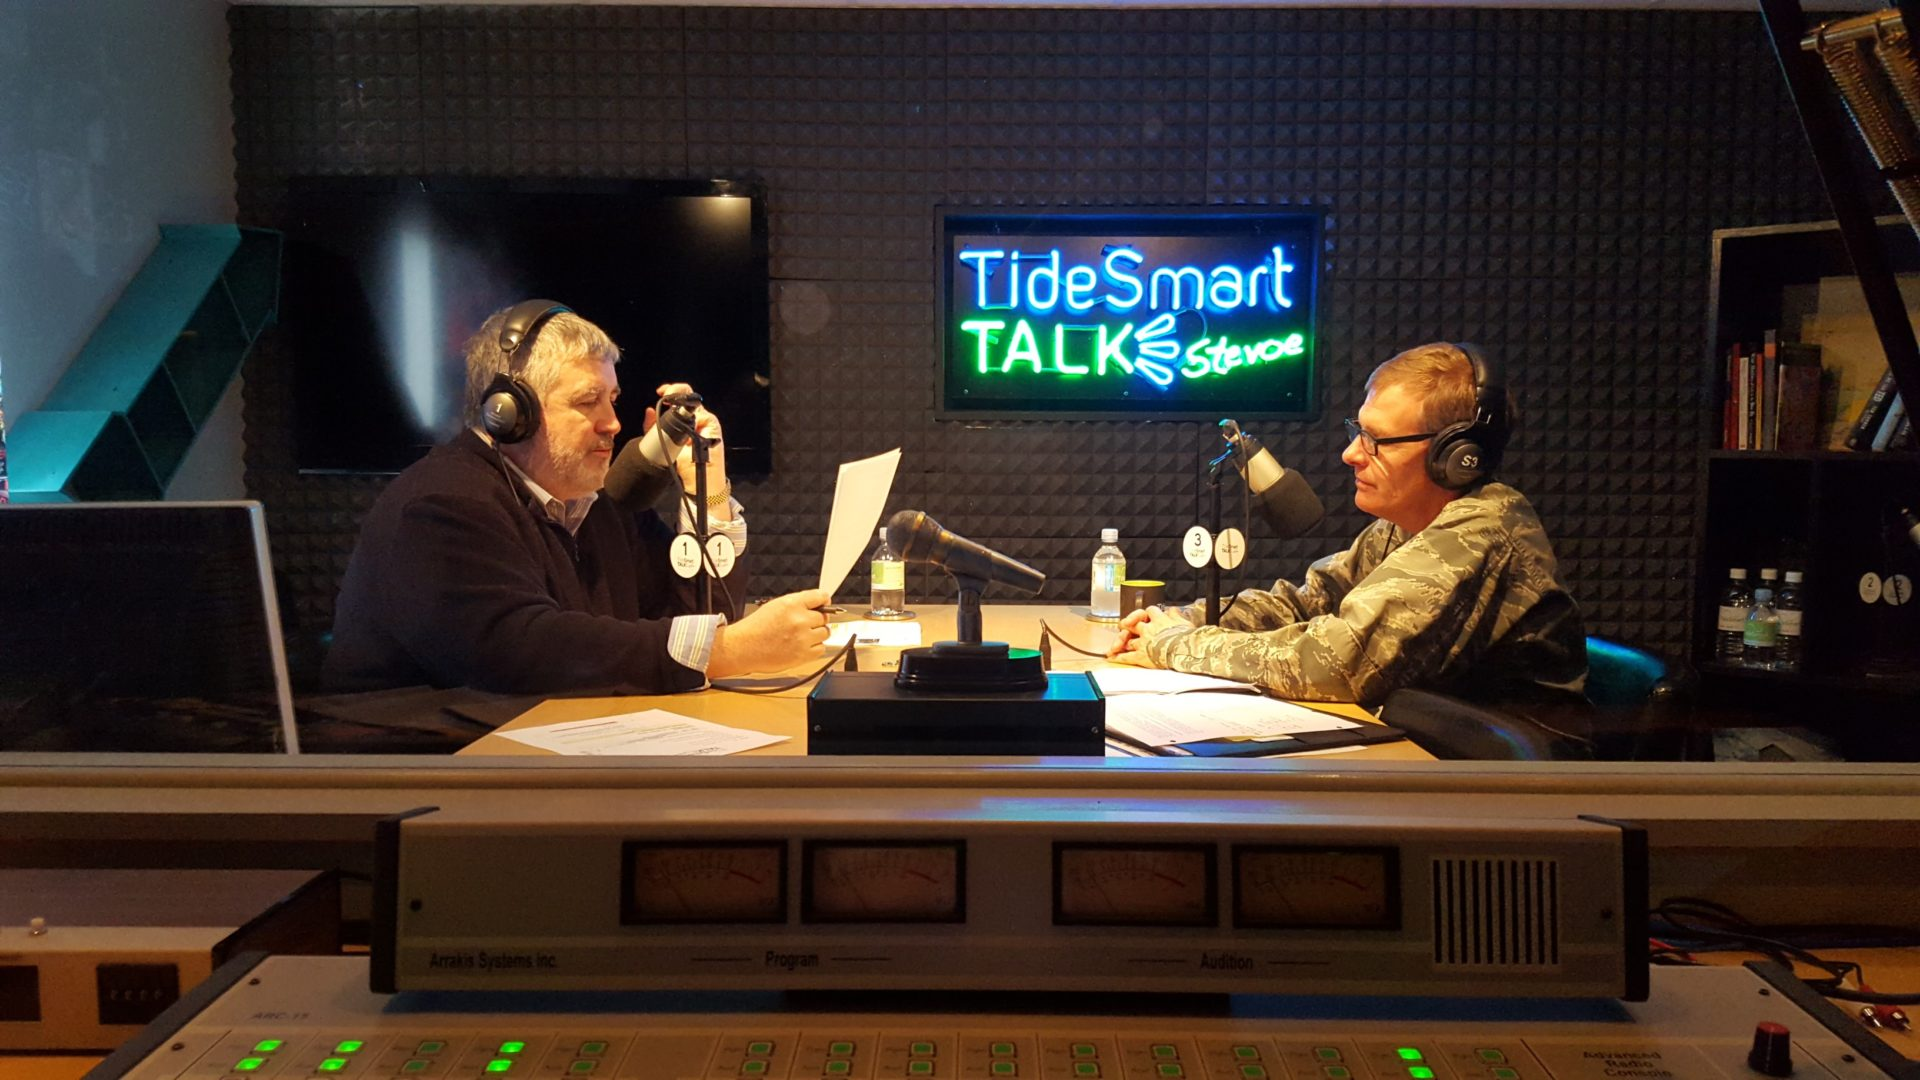 Host of TideSmart Talk with Stevoe, Steve Woods, welcomed Brigadier General Doug Farnham (at right).